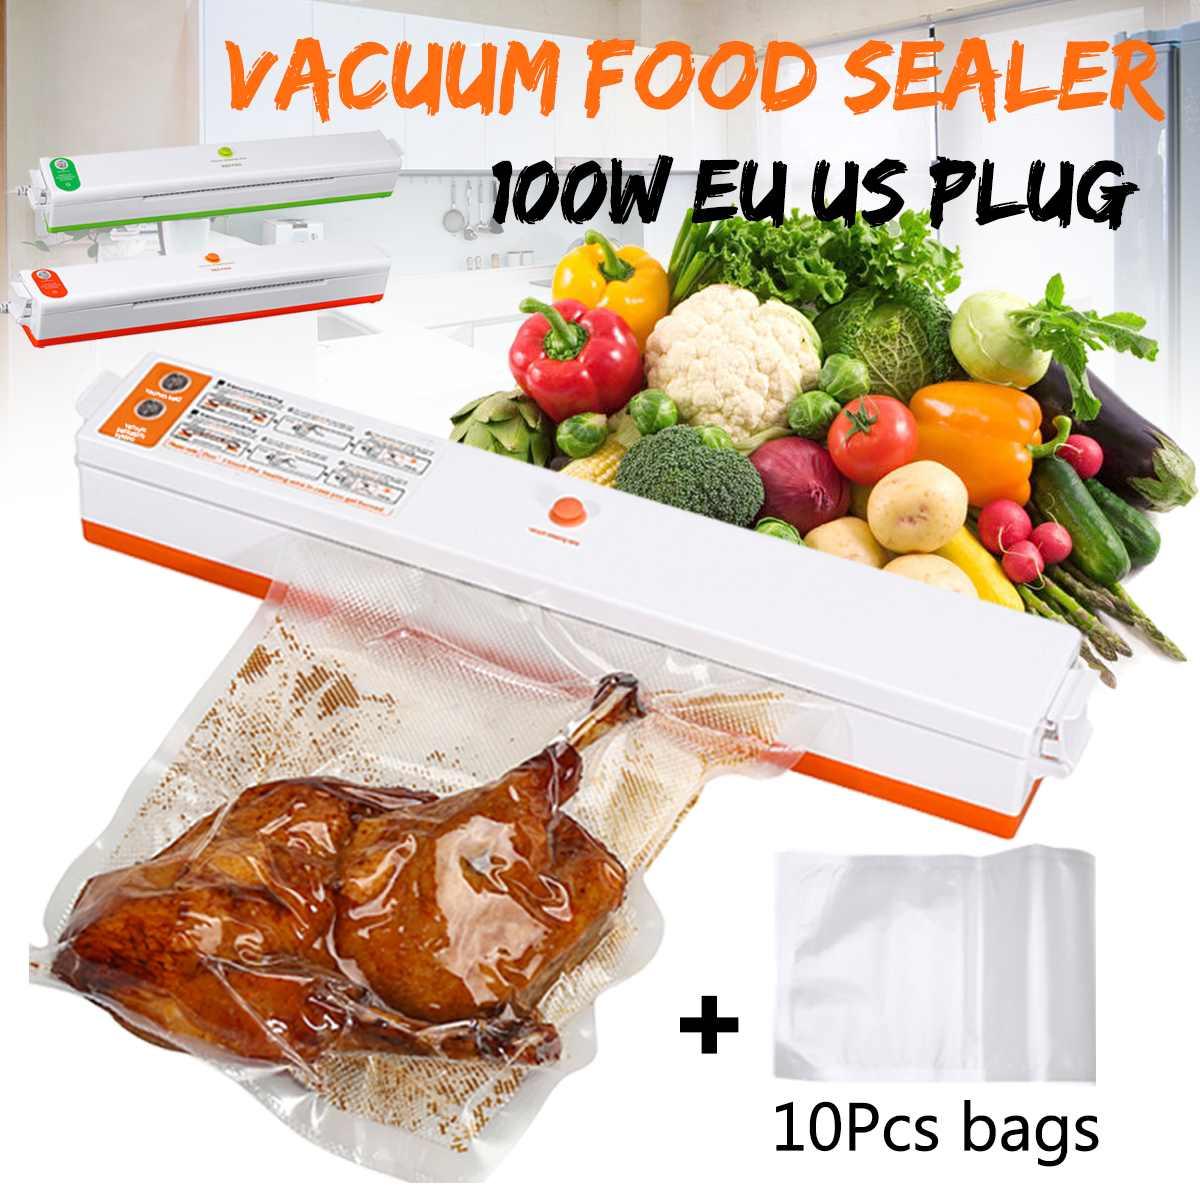 Green 200V Household Food Vacuum Sealer Packaging Auto Machine Film Sealer Vacuum Packer Including With 10Pcs Bags EU/US Plugs